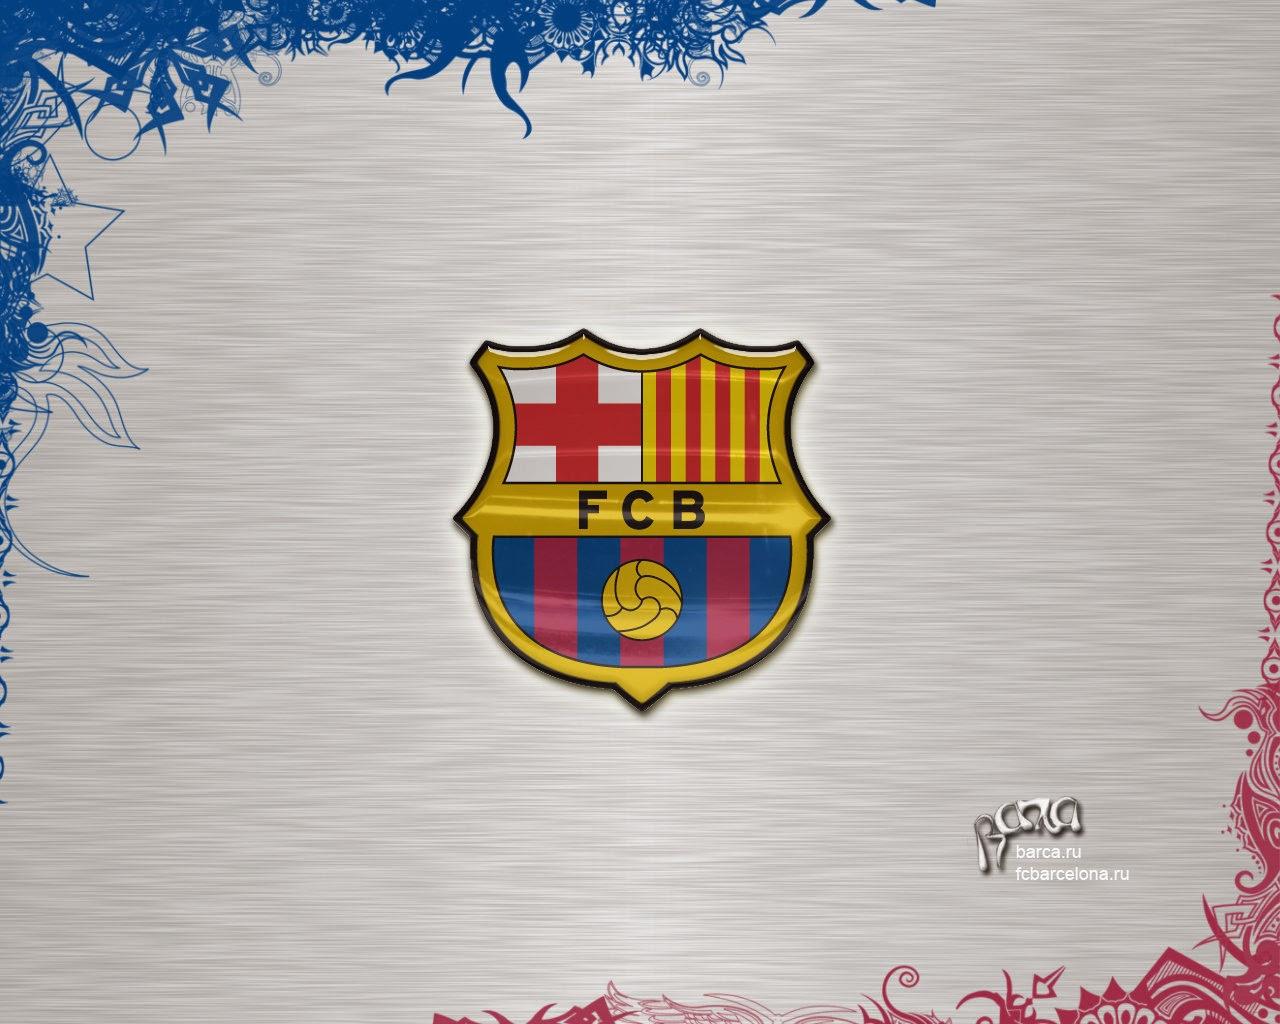 Fc Barcelona 3d Crest Live Wallpaper Barcelona Football Club Wallpaper Football Wallpaper Hd